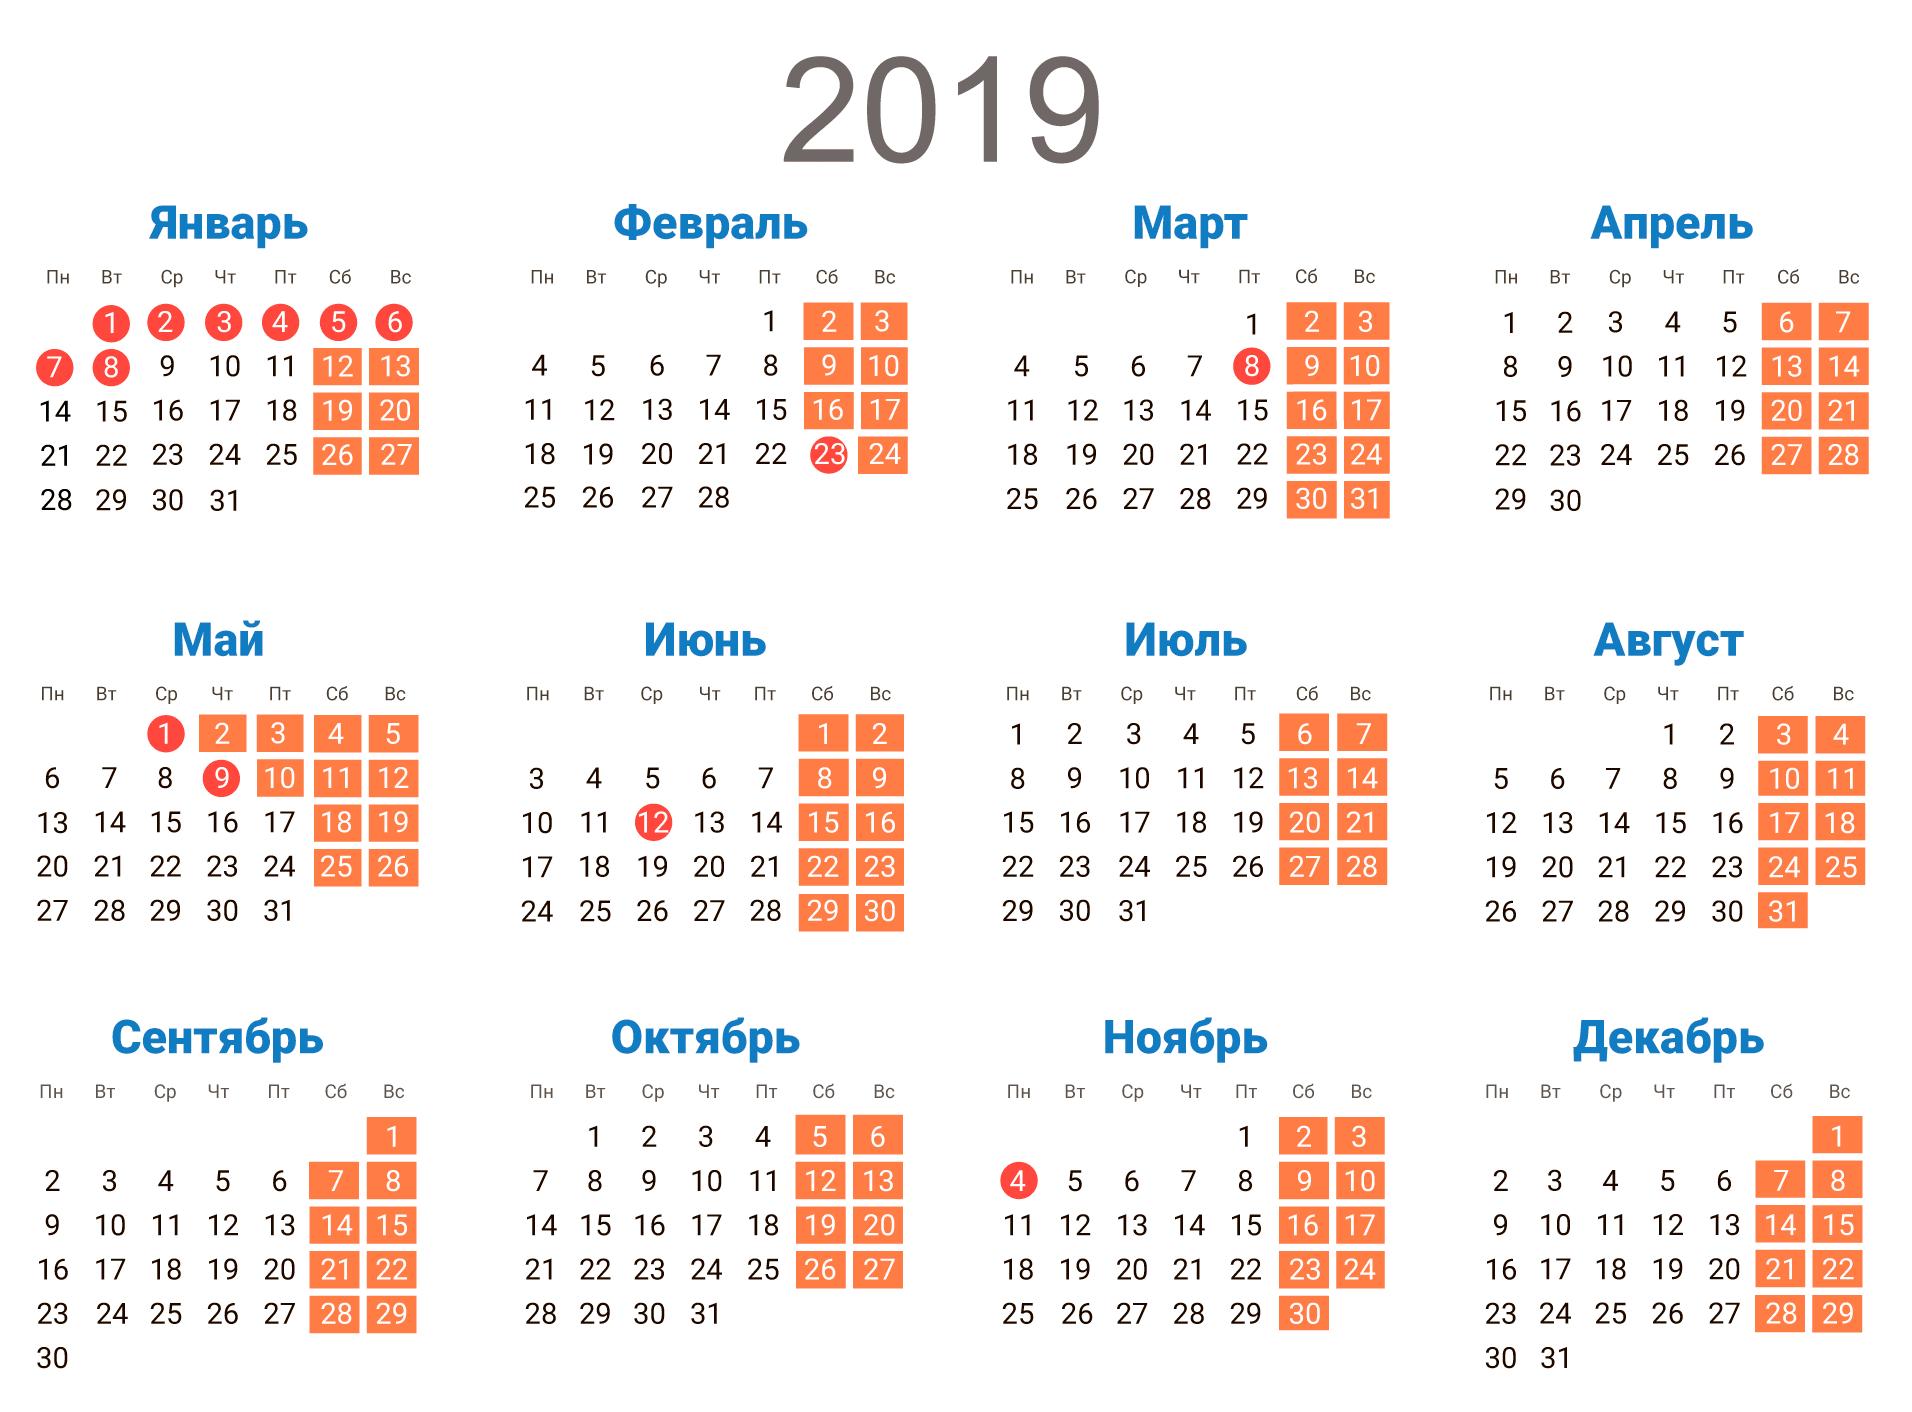 конструкция яндекс картинки календарь 2019 изучать